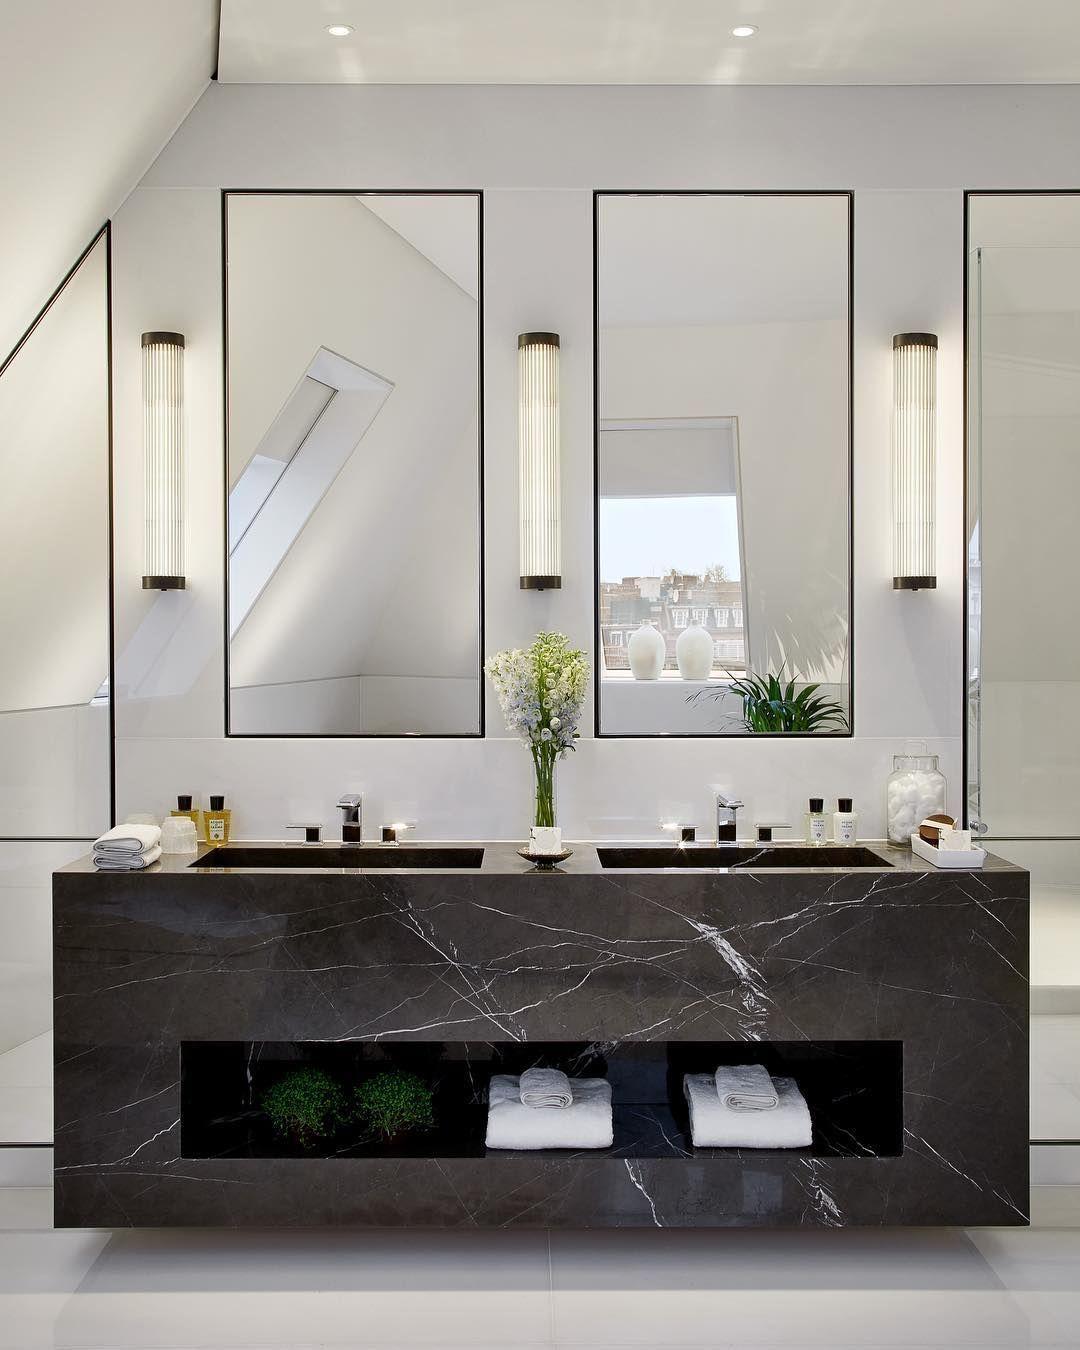 Phenomenal Bathroom Mirror Ideas For Double Sink Bathroom Mirror Vanity Bathroomdesign Ba Stylish Bathroom Bathroom Interior Design Double Vanity Bathroom [ 1350 x 1080 Pixel ]